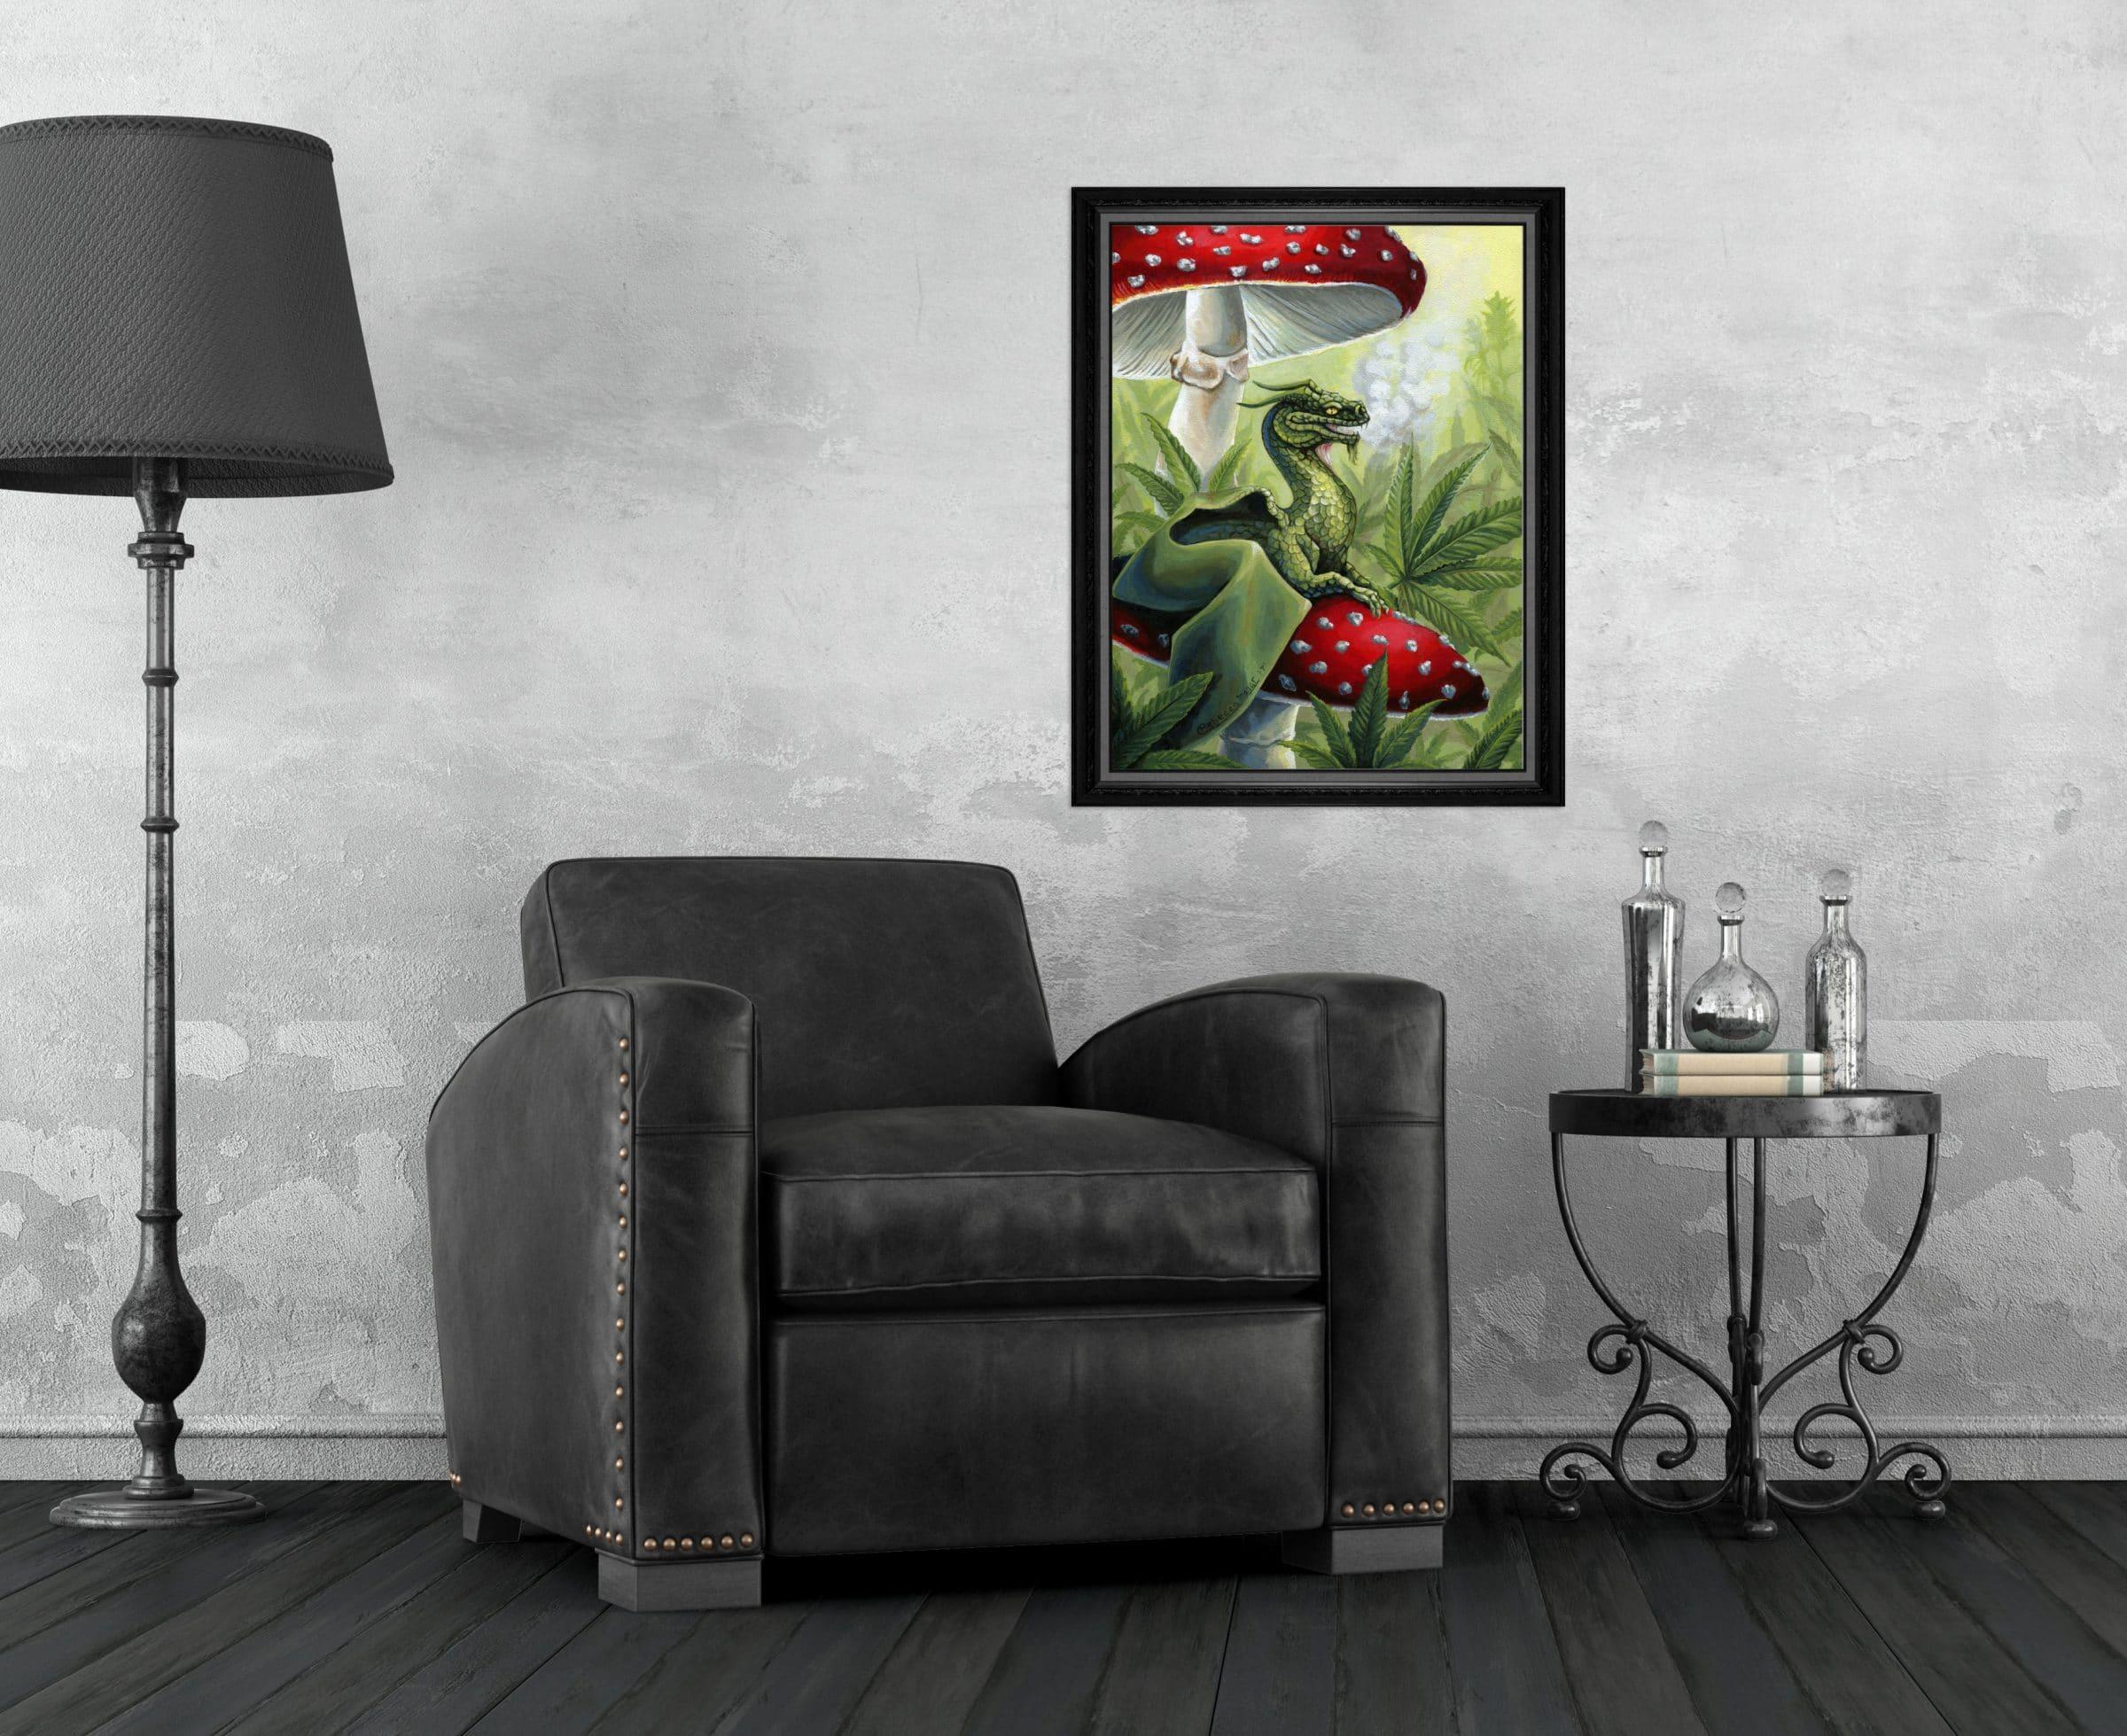 Green Dragon - Dragon Sitting on Toadstool in Cannabis Leaves Print